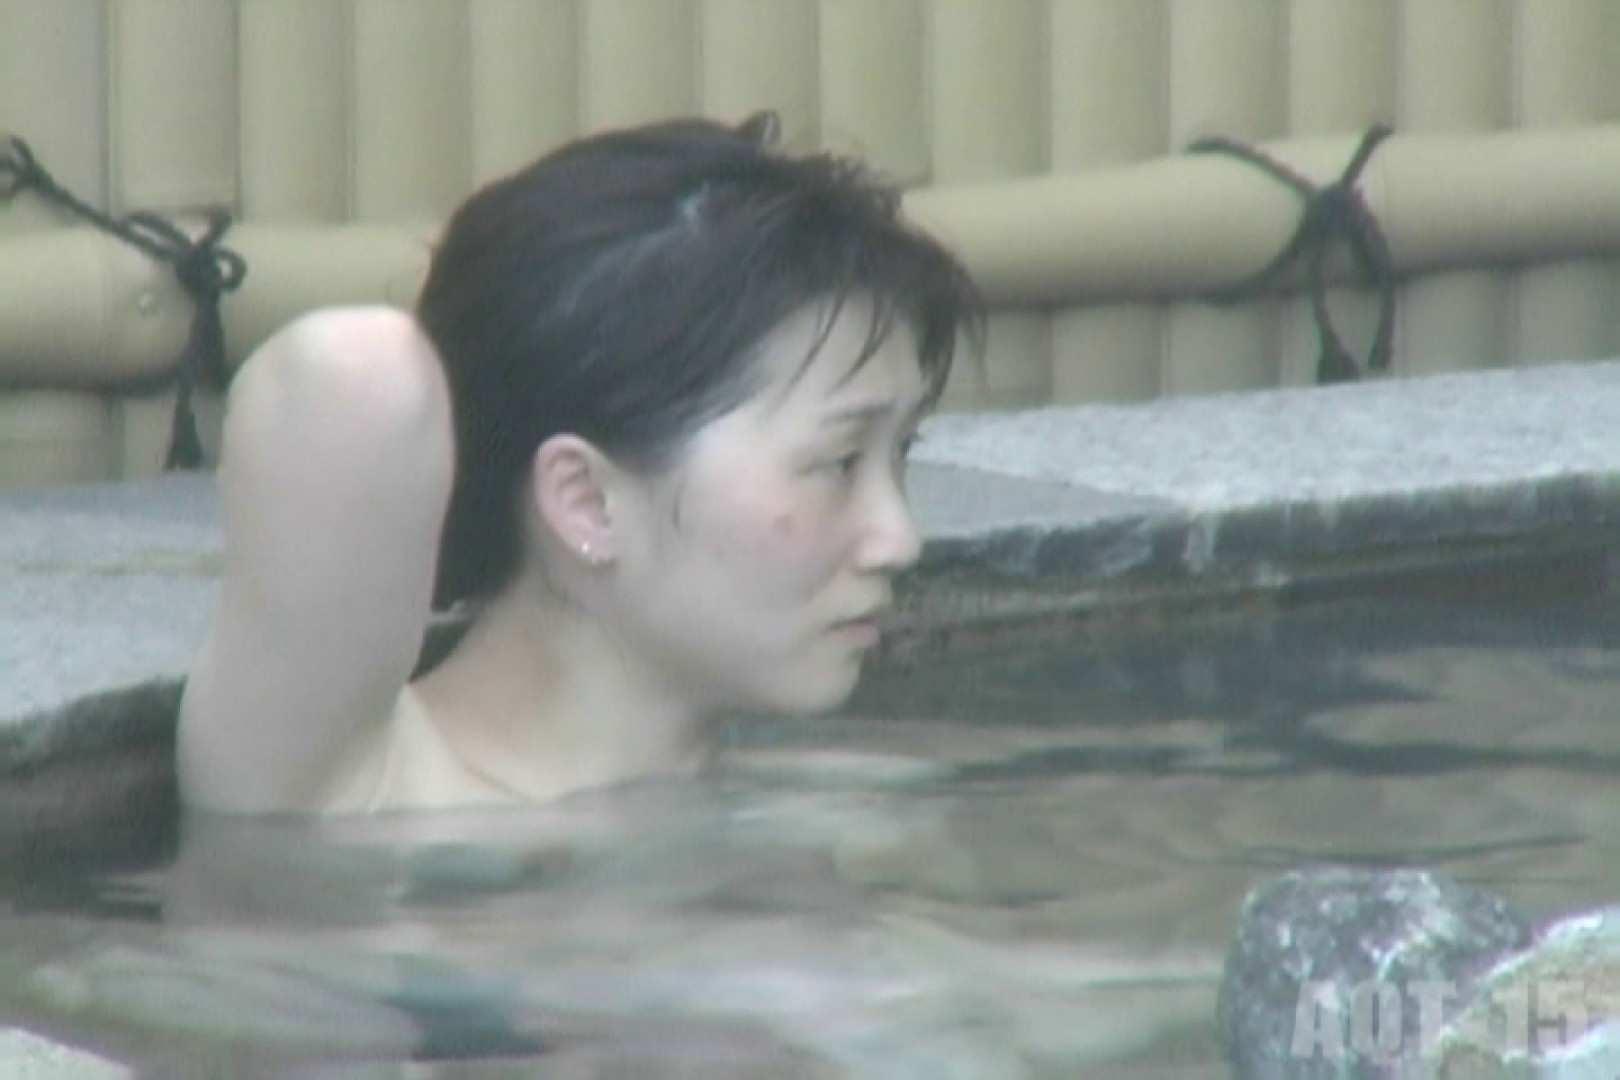 Aquaな露天風呂Vol.831 綺麗なOLたち セックス画像 75枚 59